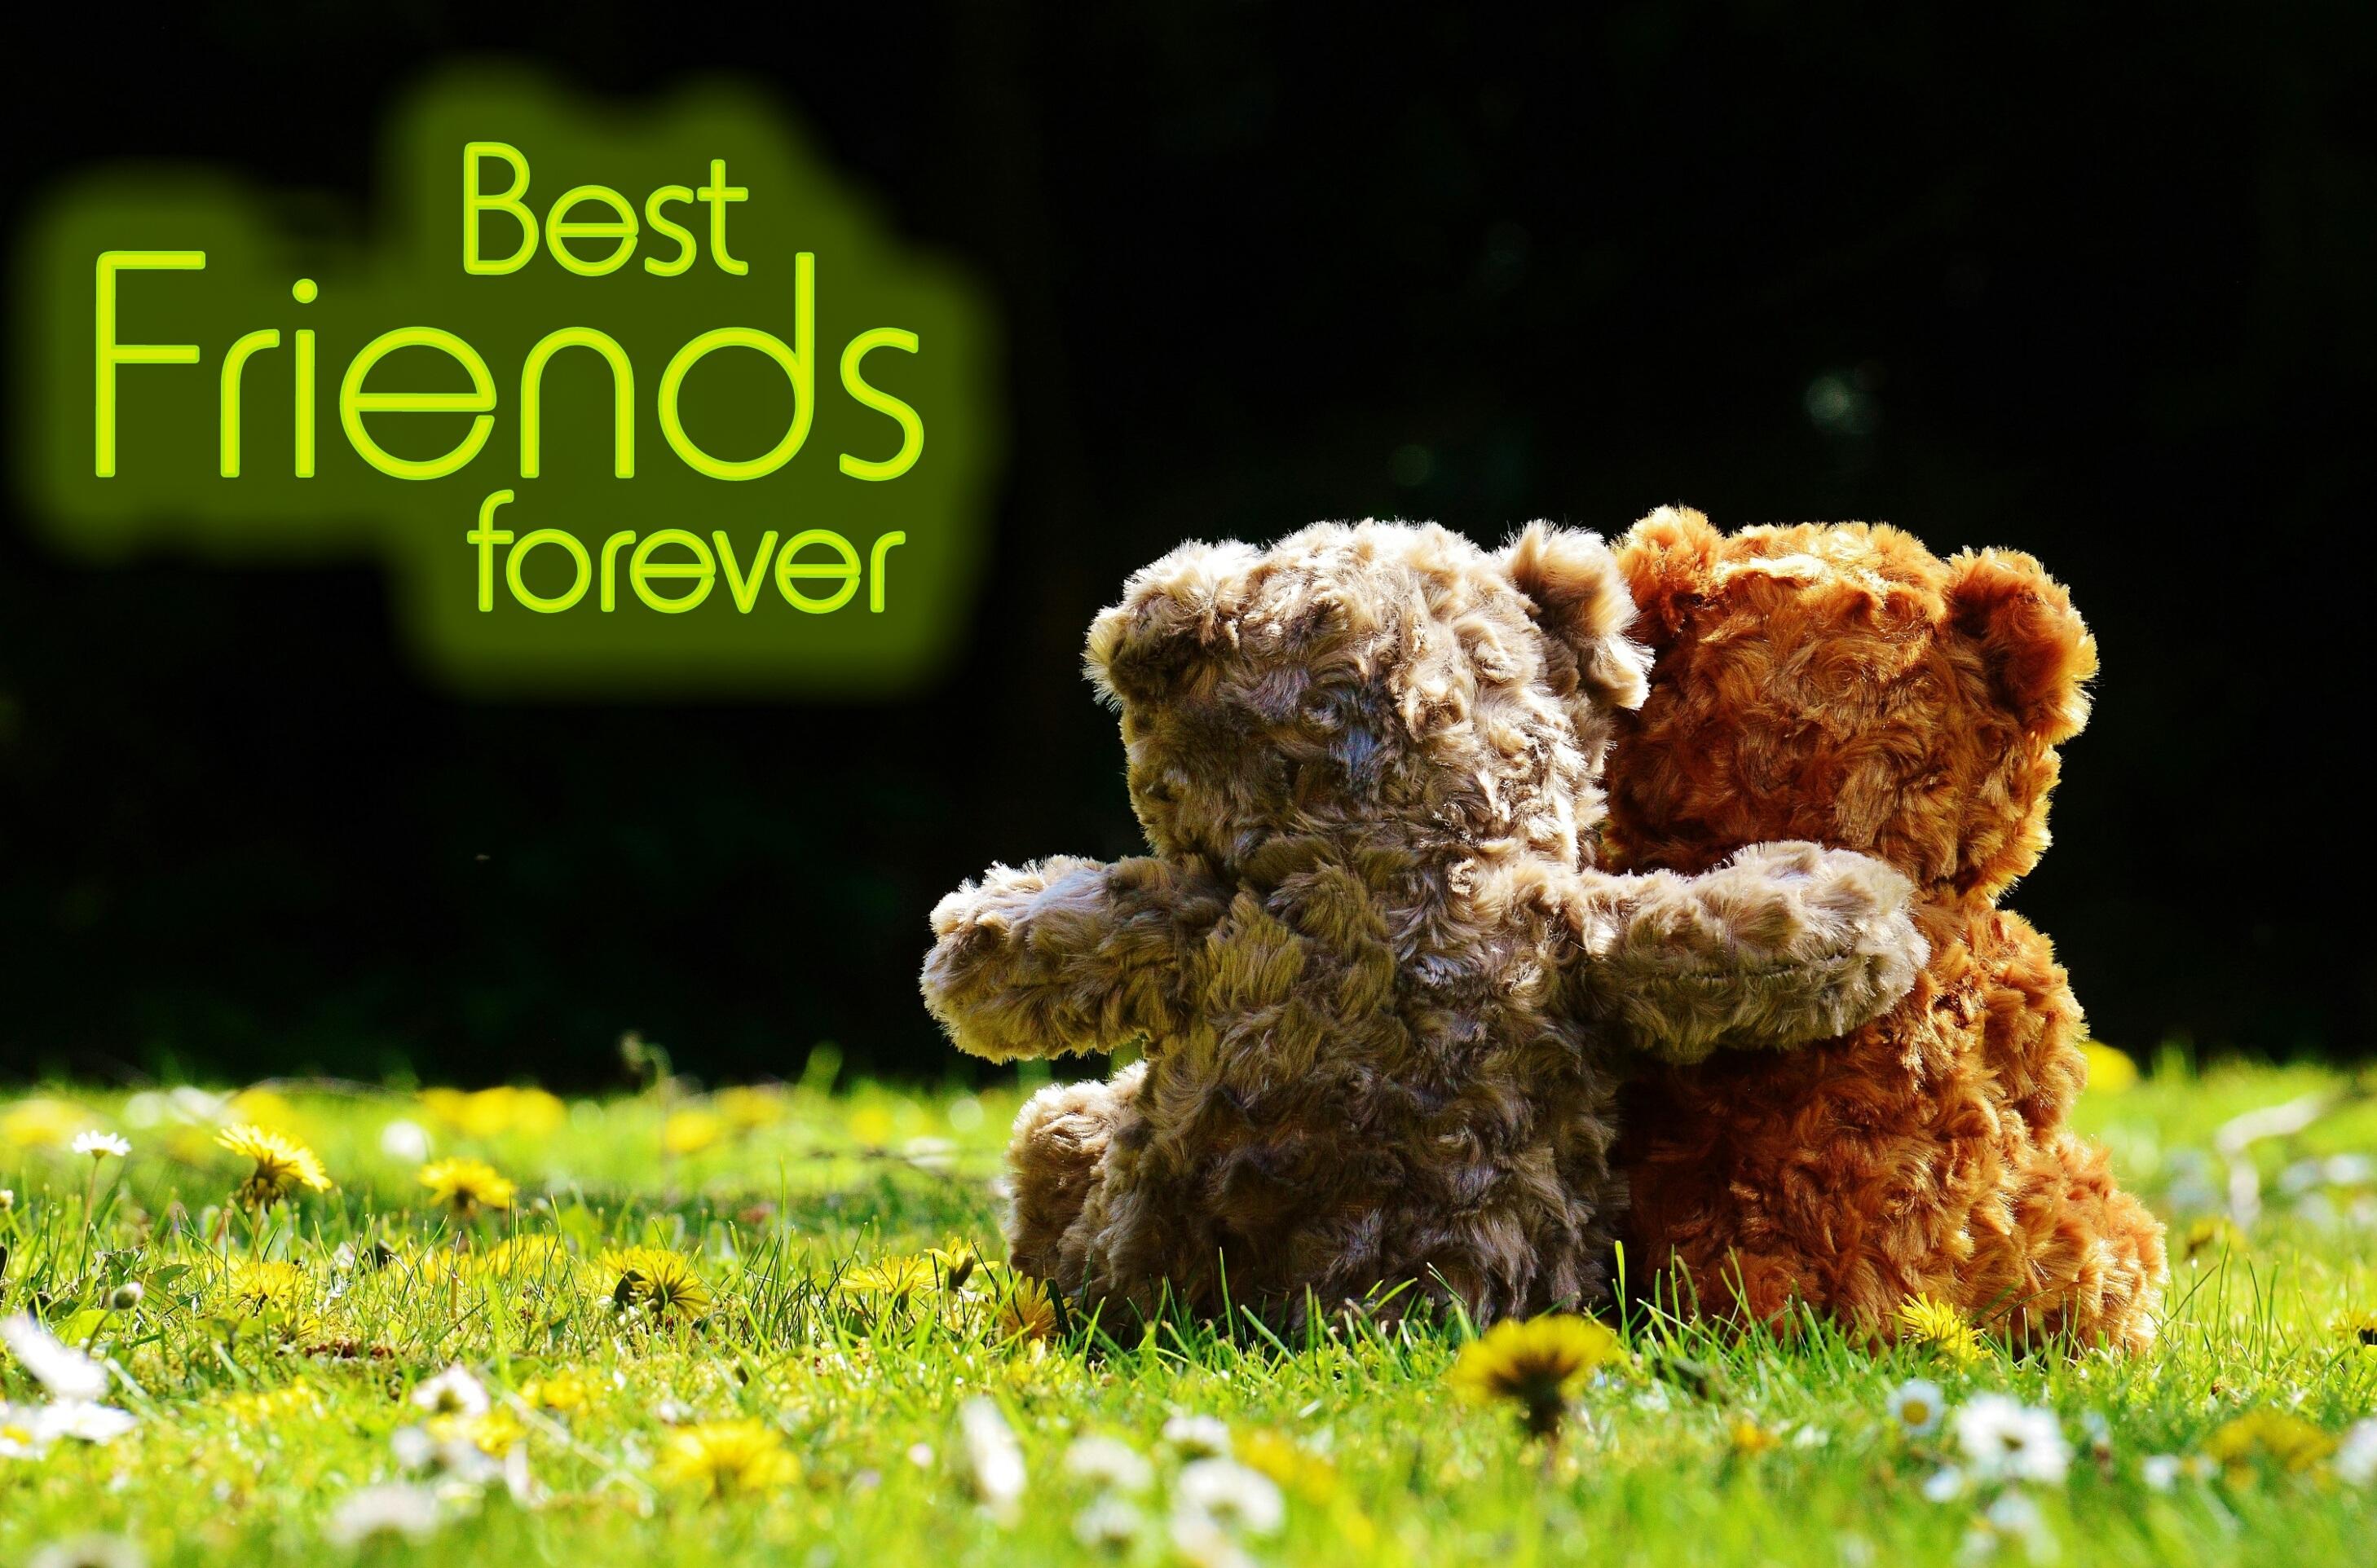 sweet cute bear love produce romance romantic friendship forever teddy bear  affection friends toys bears funny